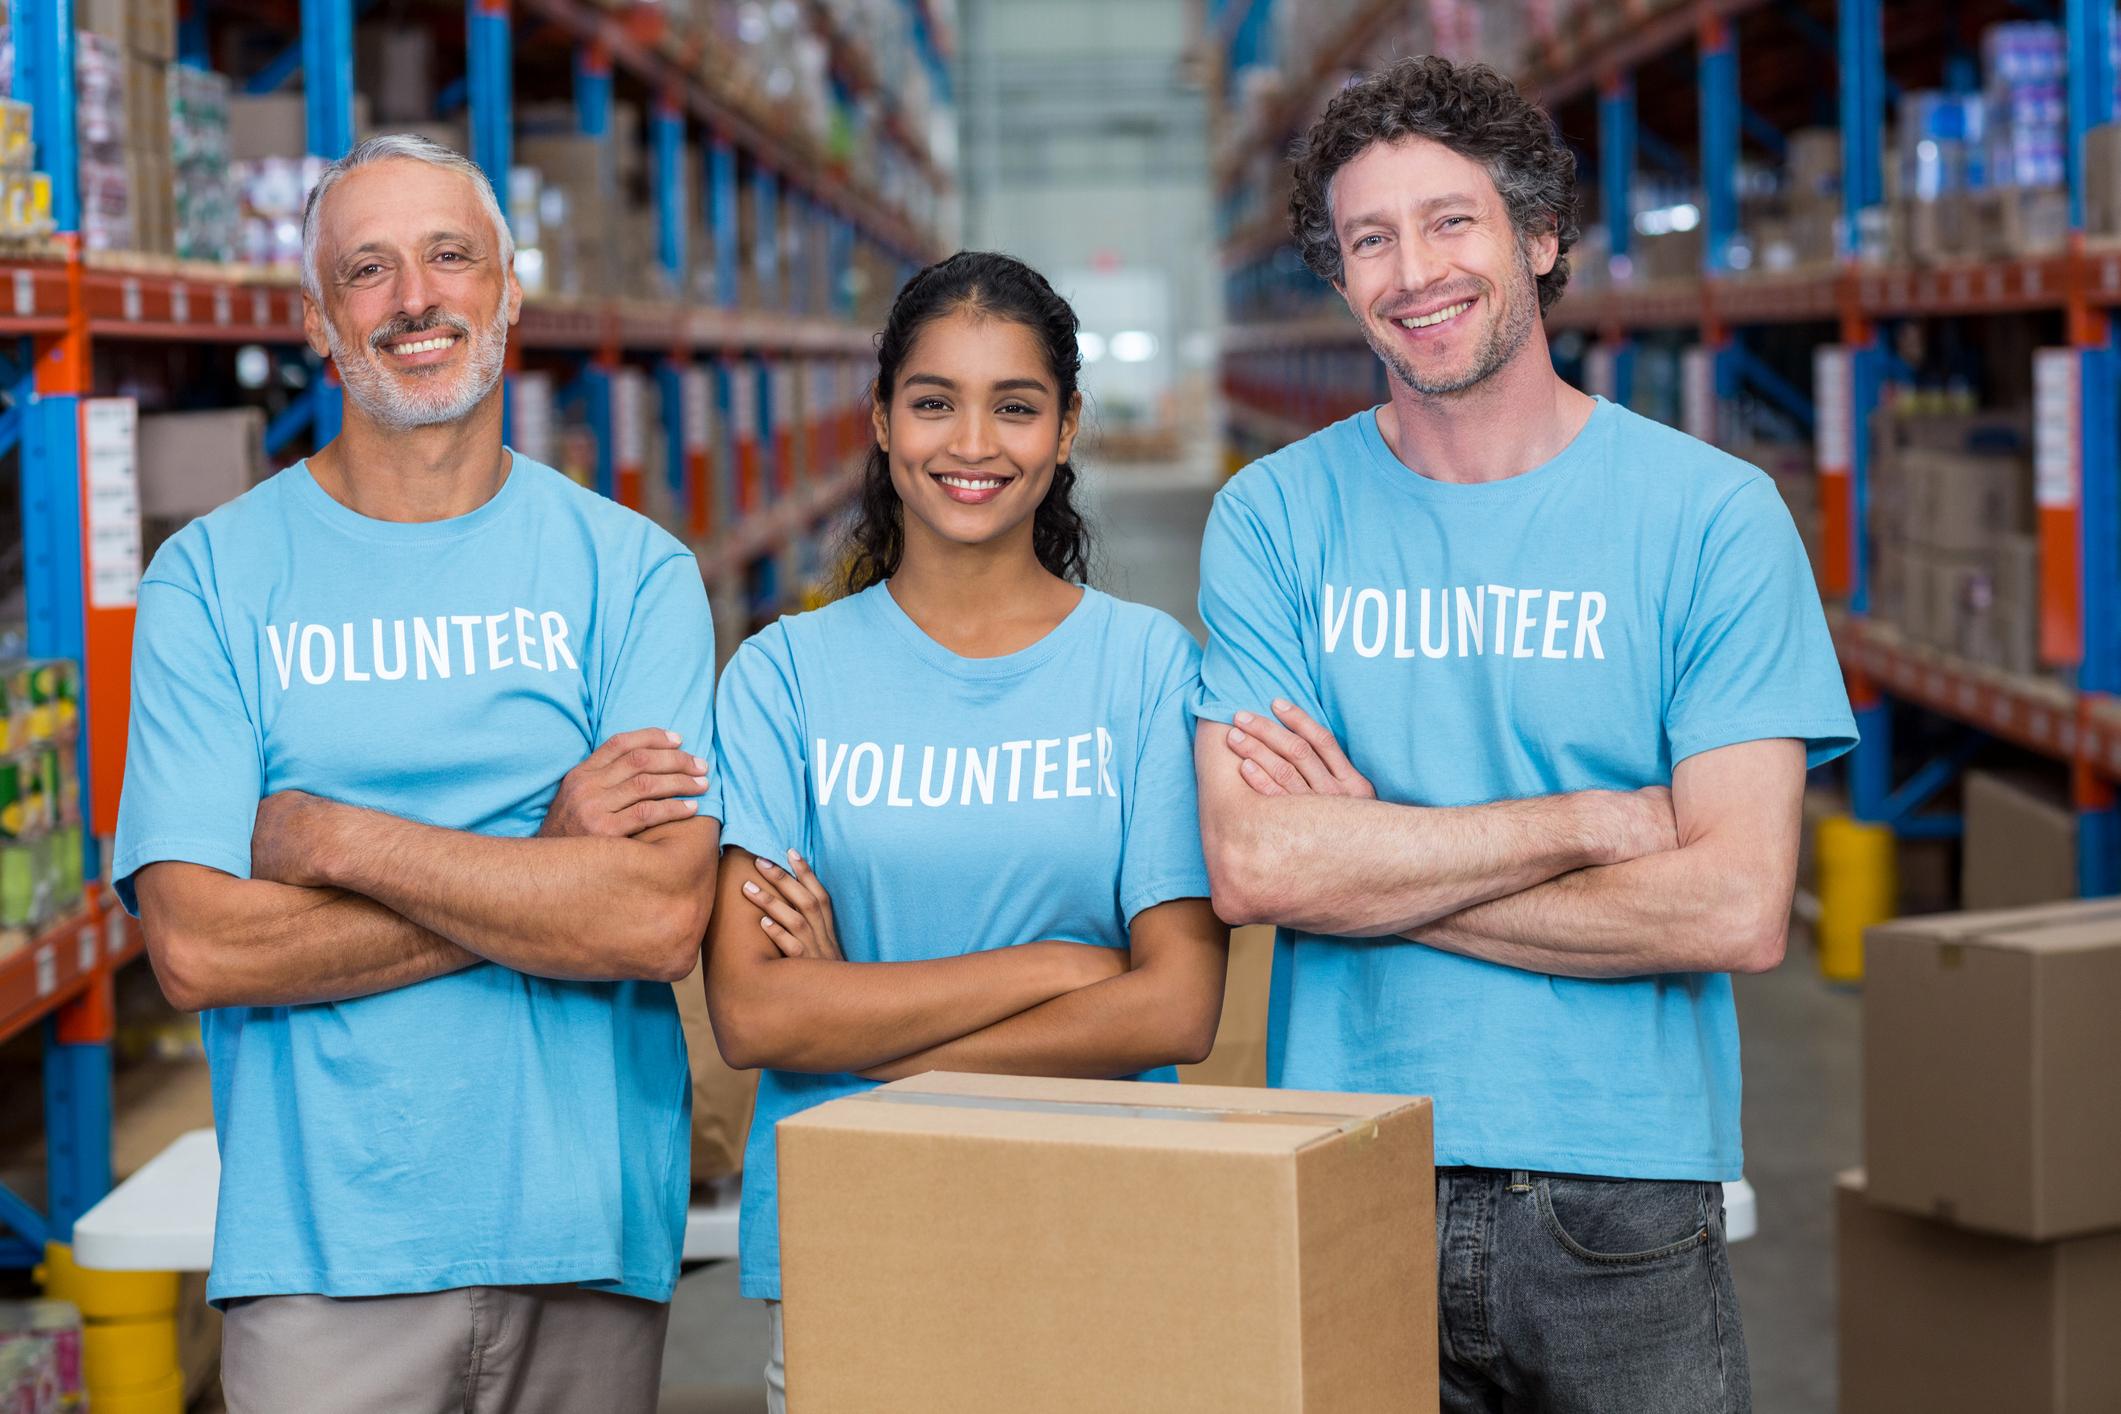 insurance for volunteers